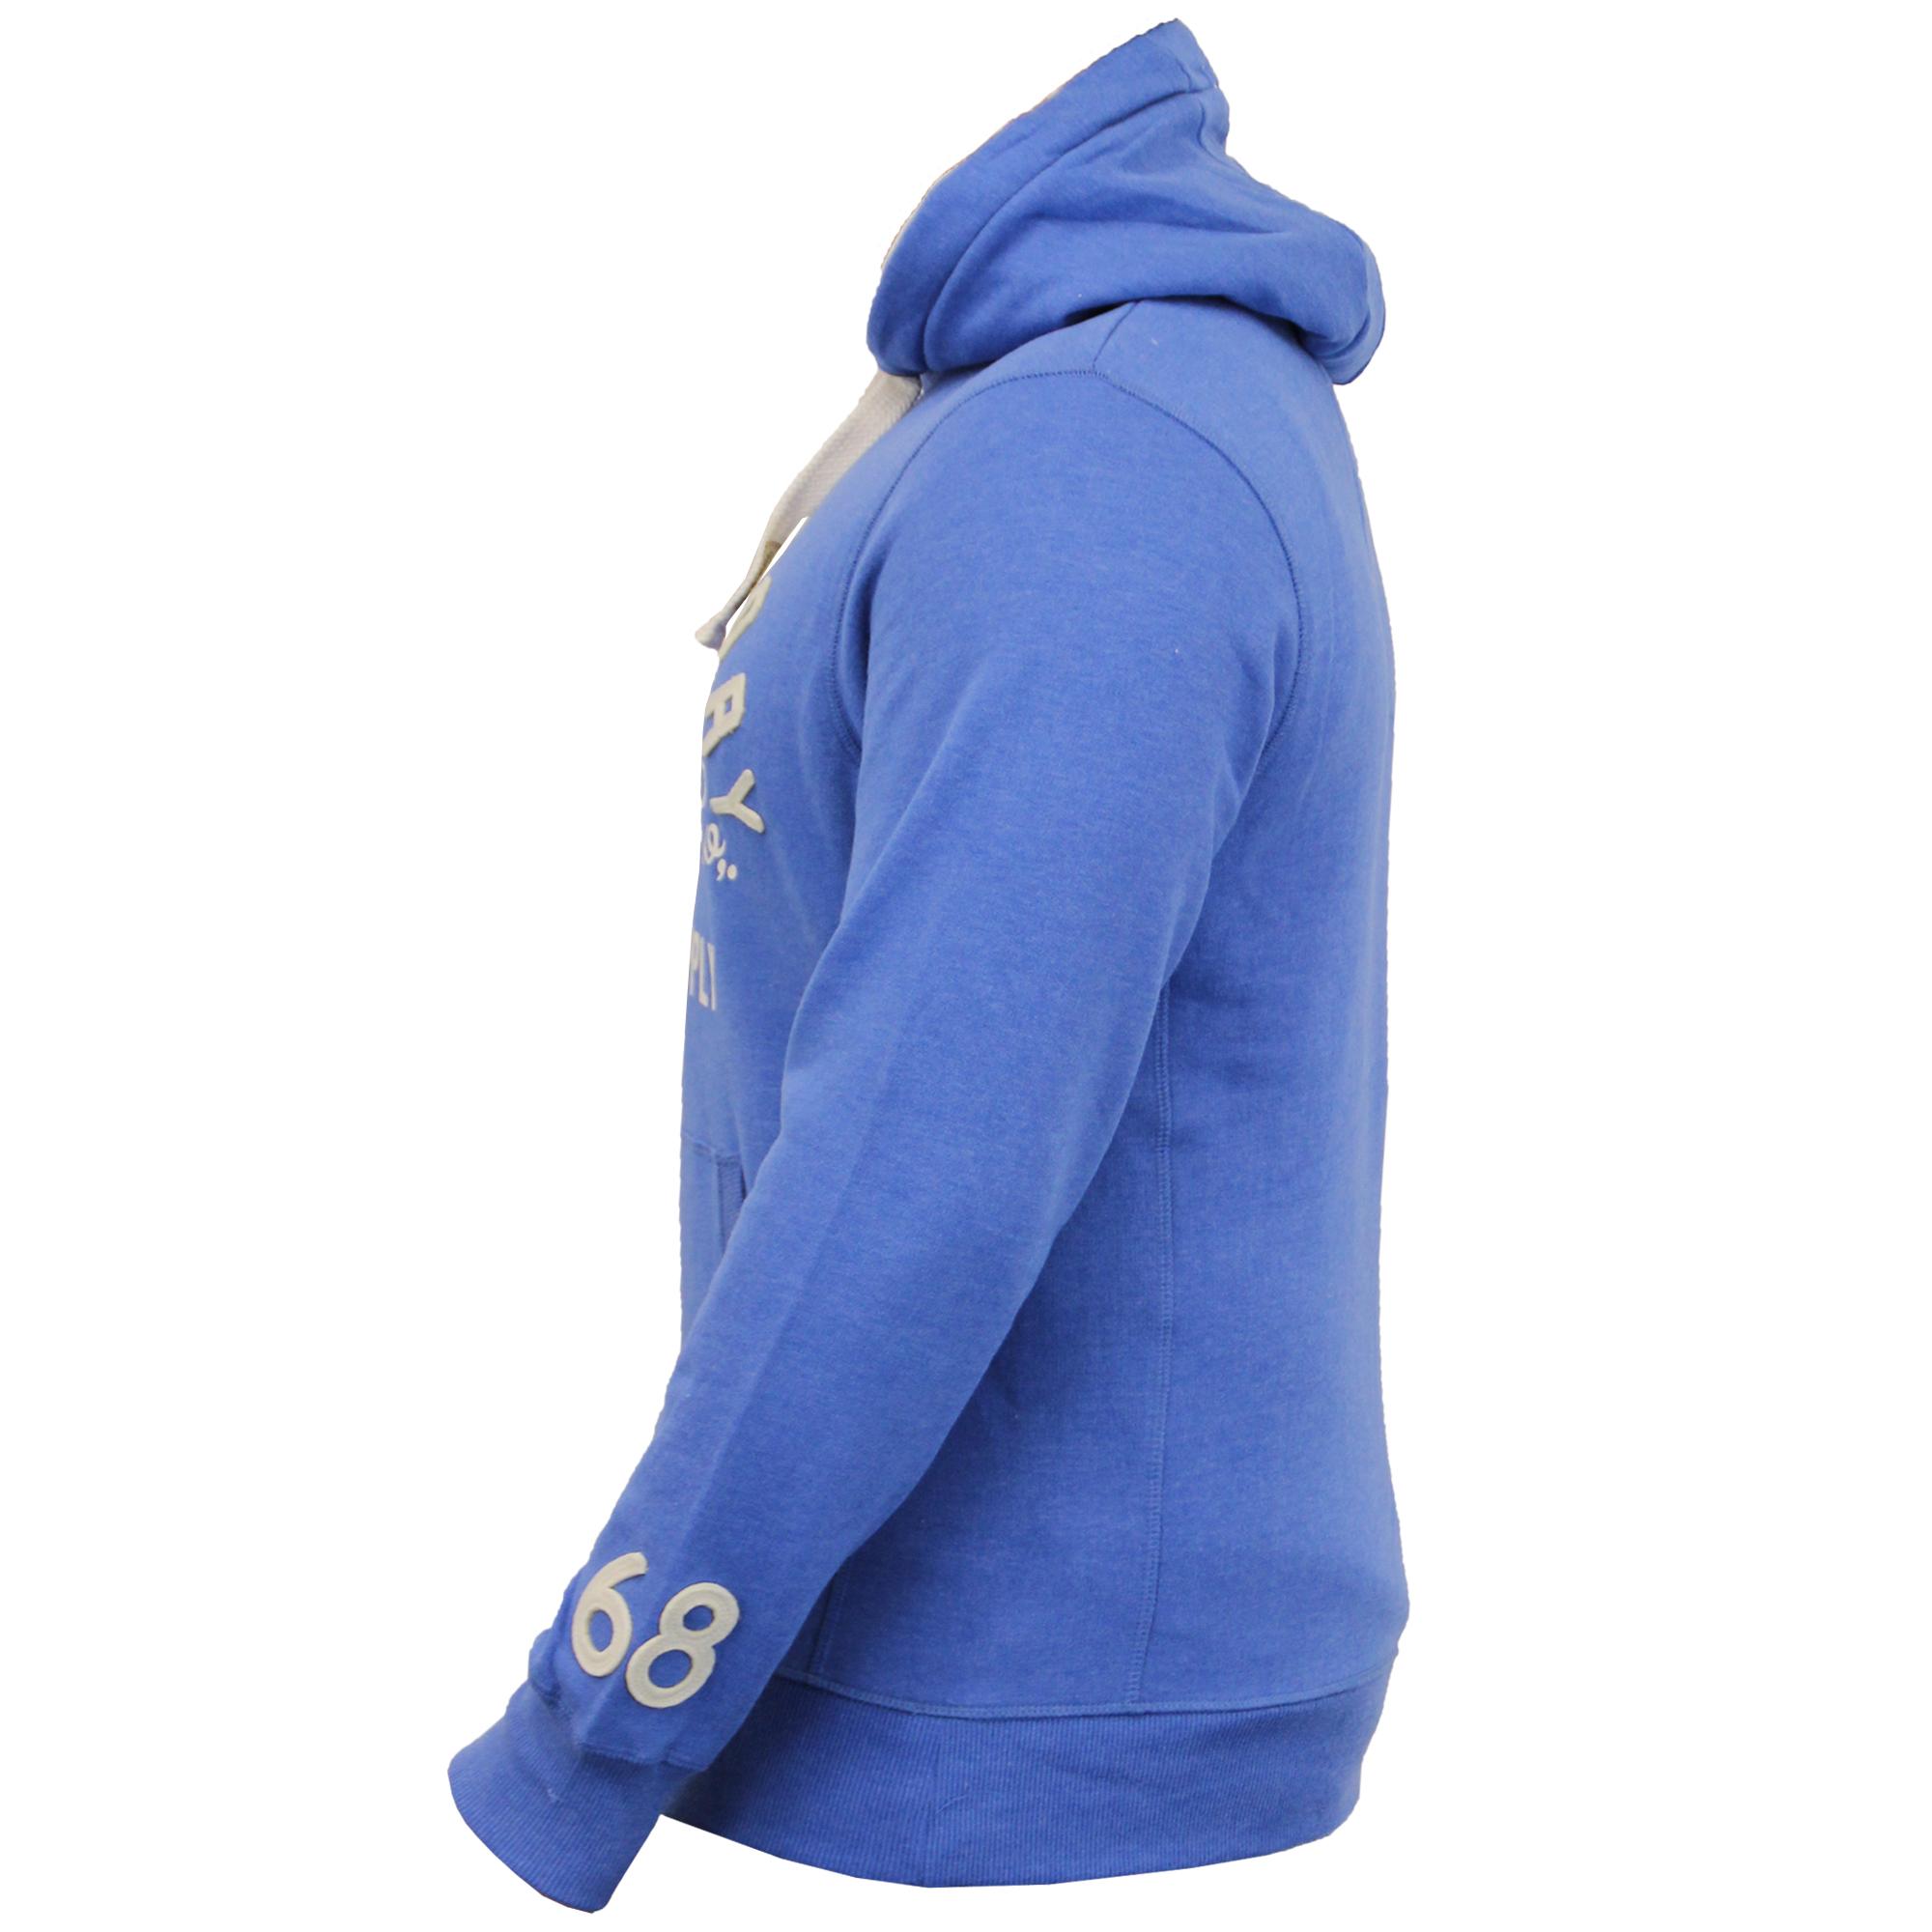 Mens-Sweatshirt-Tokyo-Laundry-Hooded-Top-Sweat-Applique-Zip-Gym-Fleece-Lined-New thumbnail 9